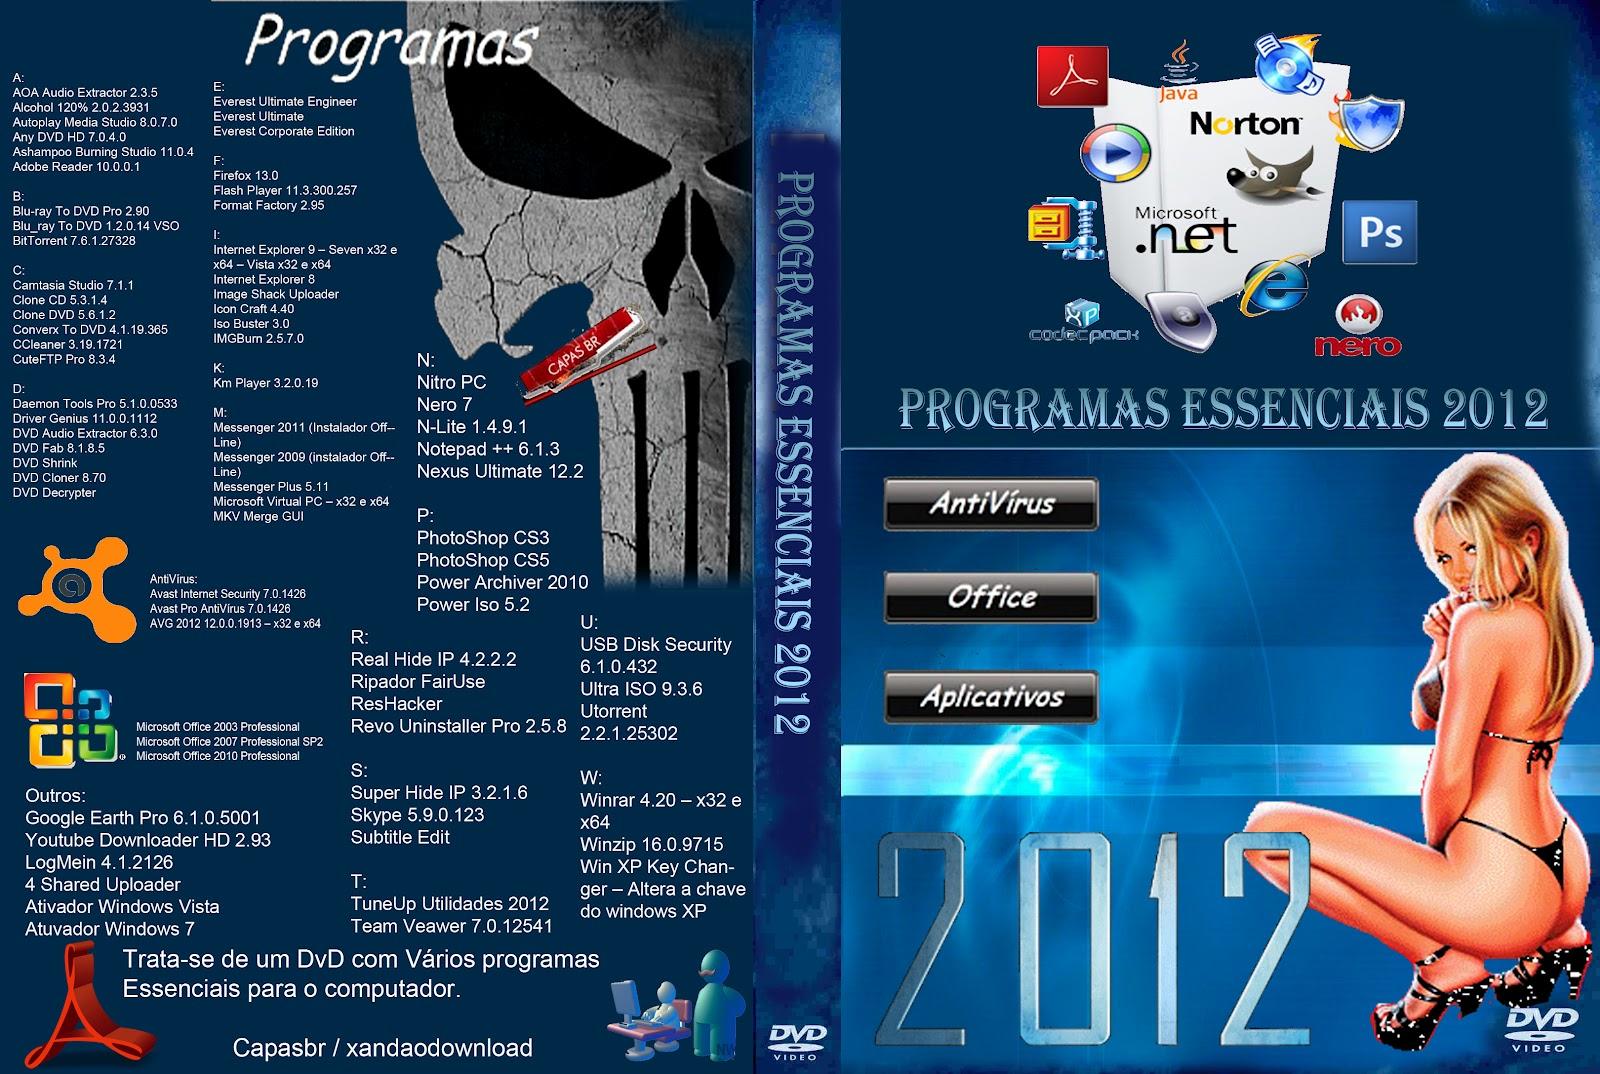 Redfox anydvd 8 2 1 0 crack | AnyDVD & AnyDVD HD 8 2 1 0 Crack Free